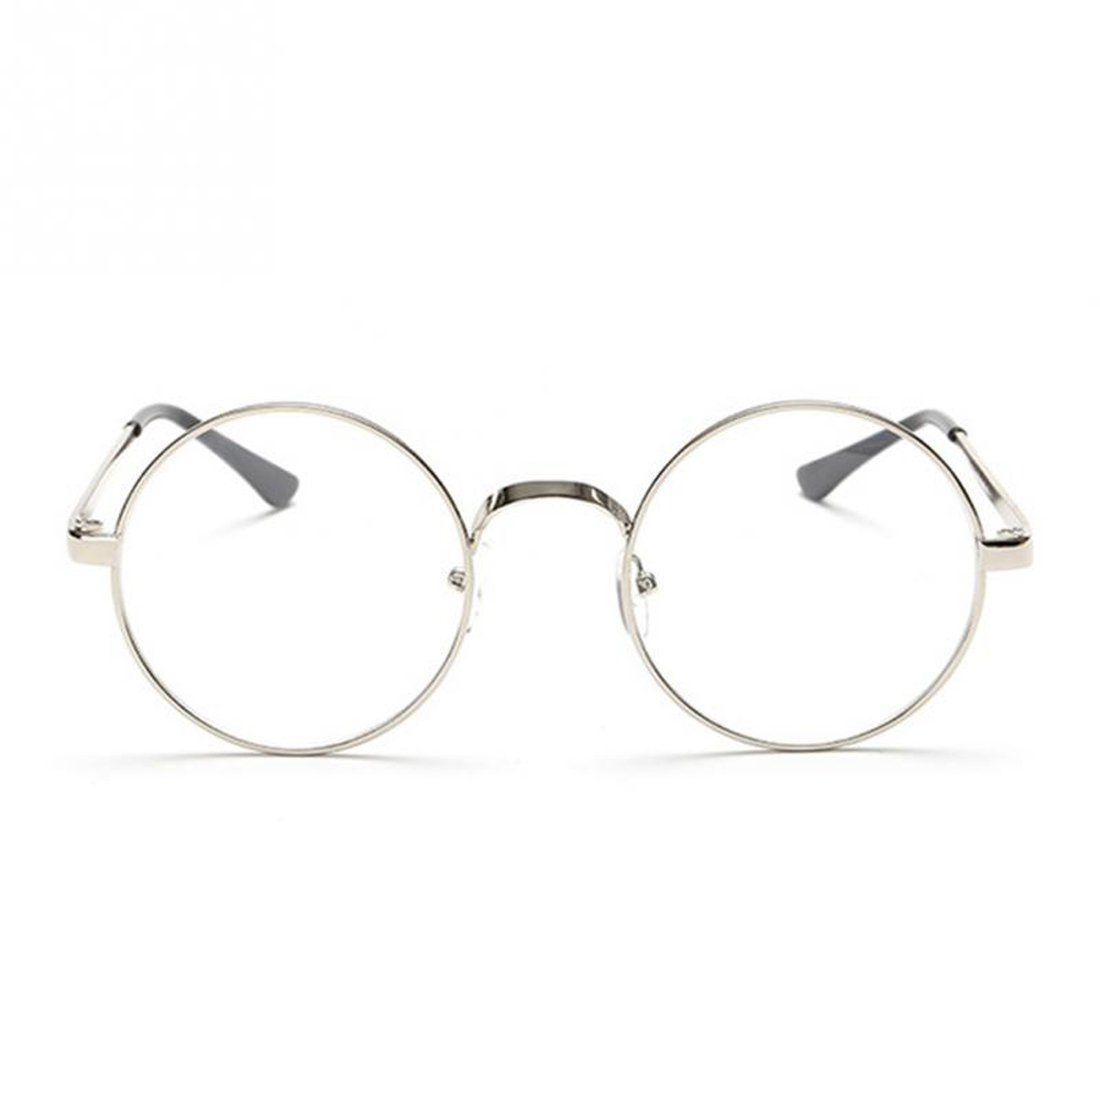 ecbf6e1ef9d34 Amazon.com  1PCS Fashion Retro Round Circle Metal Frame Eyeglasses Clear  Lens Eye Glasses Unisex Silver  Clothing